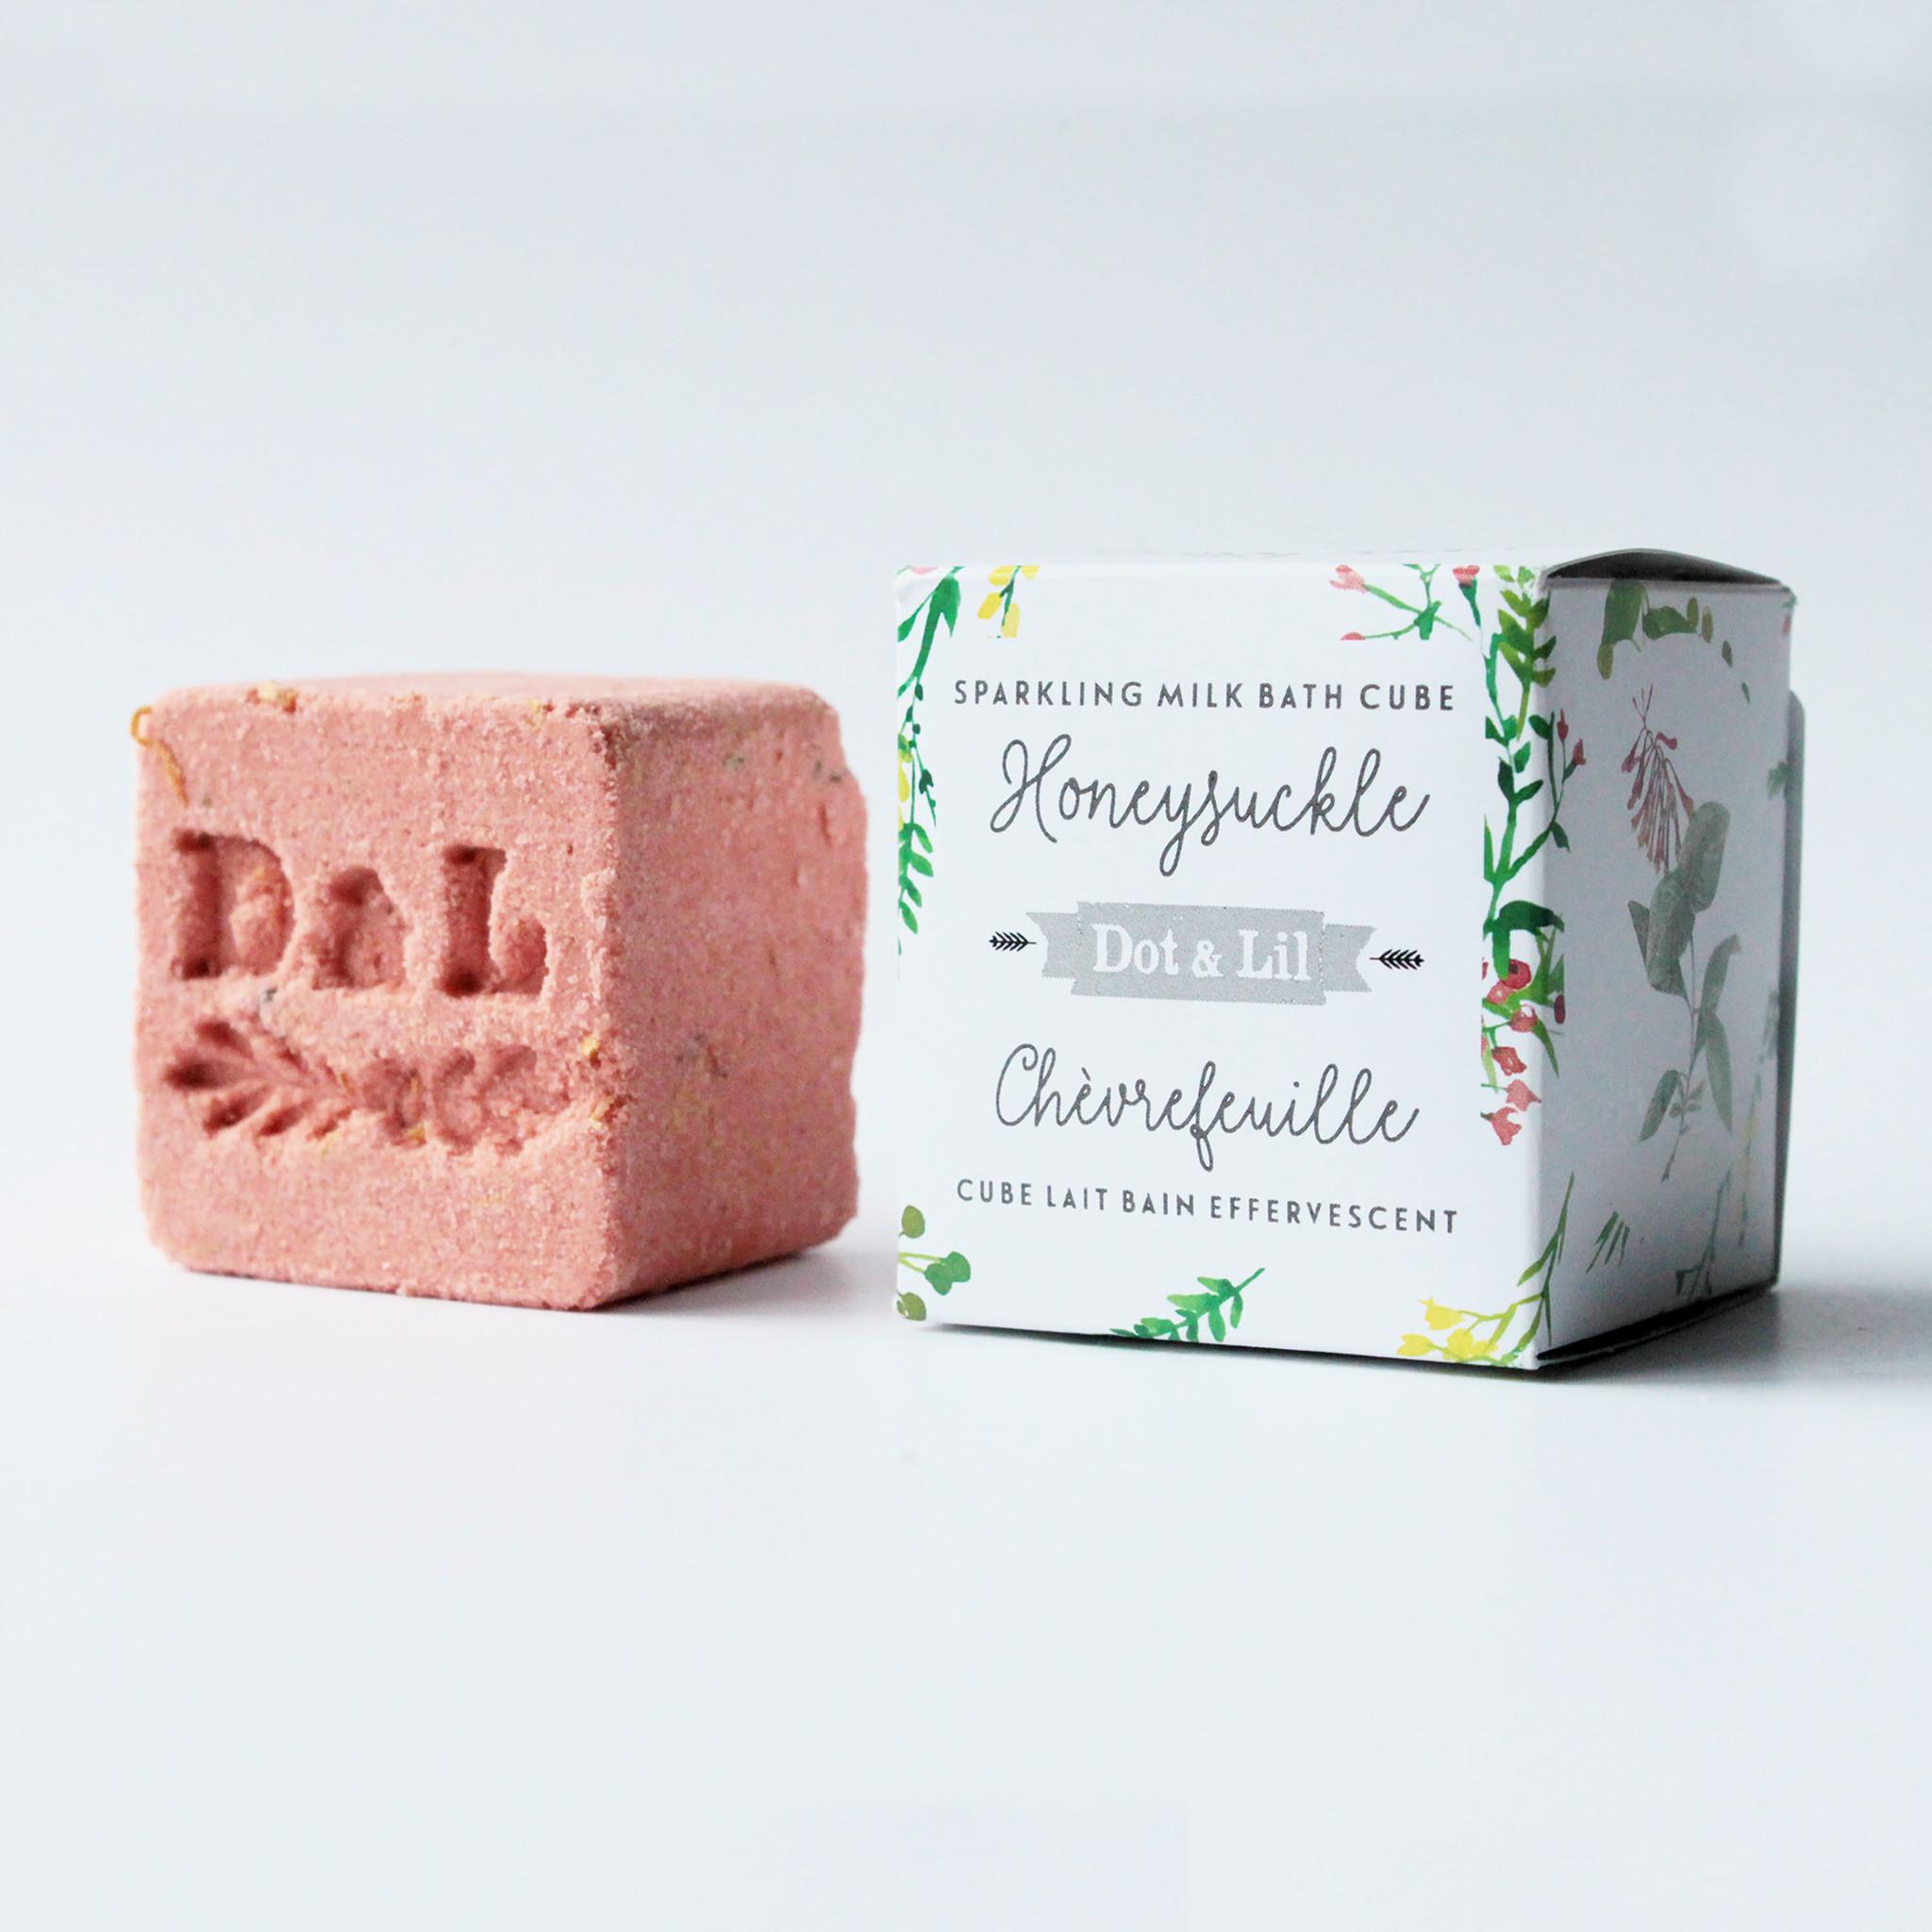 Dot and Lil Cube lait bain effervescent  chèvrefeuille